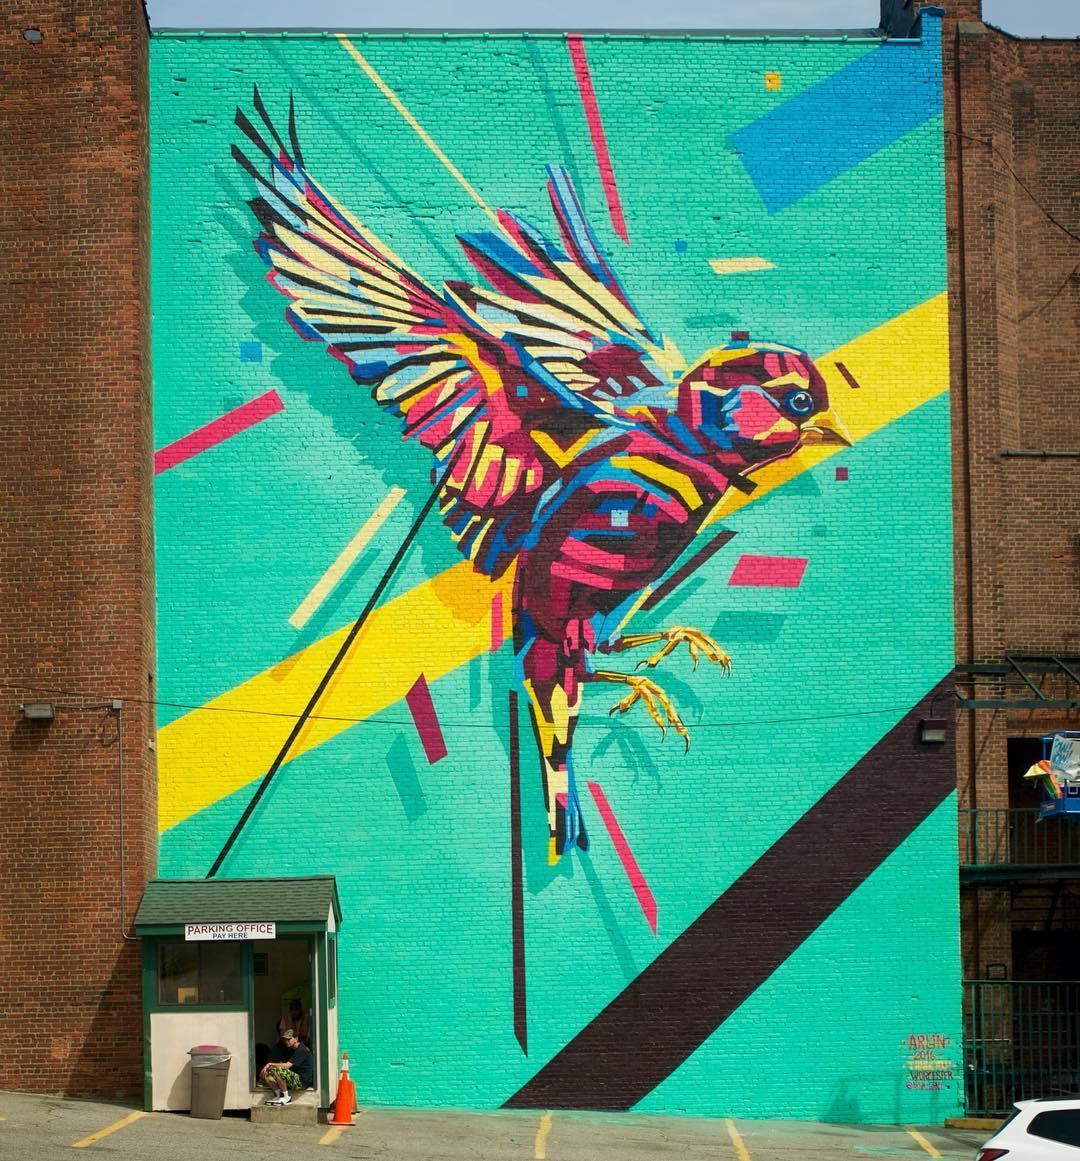 Finished mural by @arlin_graff at @powwowworcester • SprATX is proud to sponsor along side: @powwowworldwide @1xrun @monsterenergy @actionwoo @worcesterwares @worcestermagazine @thegriddistrict @homedepot @niche_hospitality @vivaelche @montanacans...